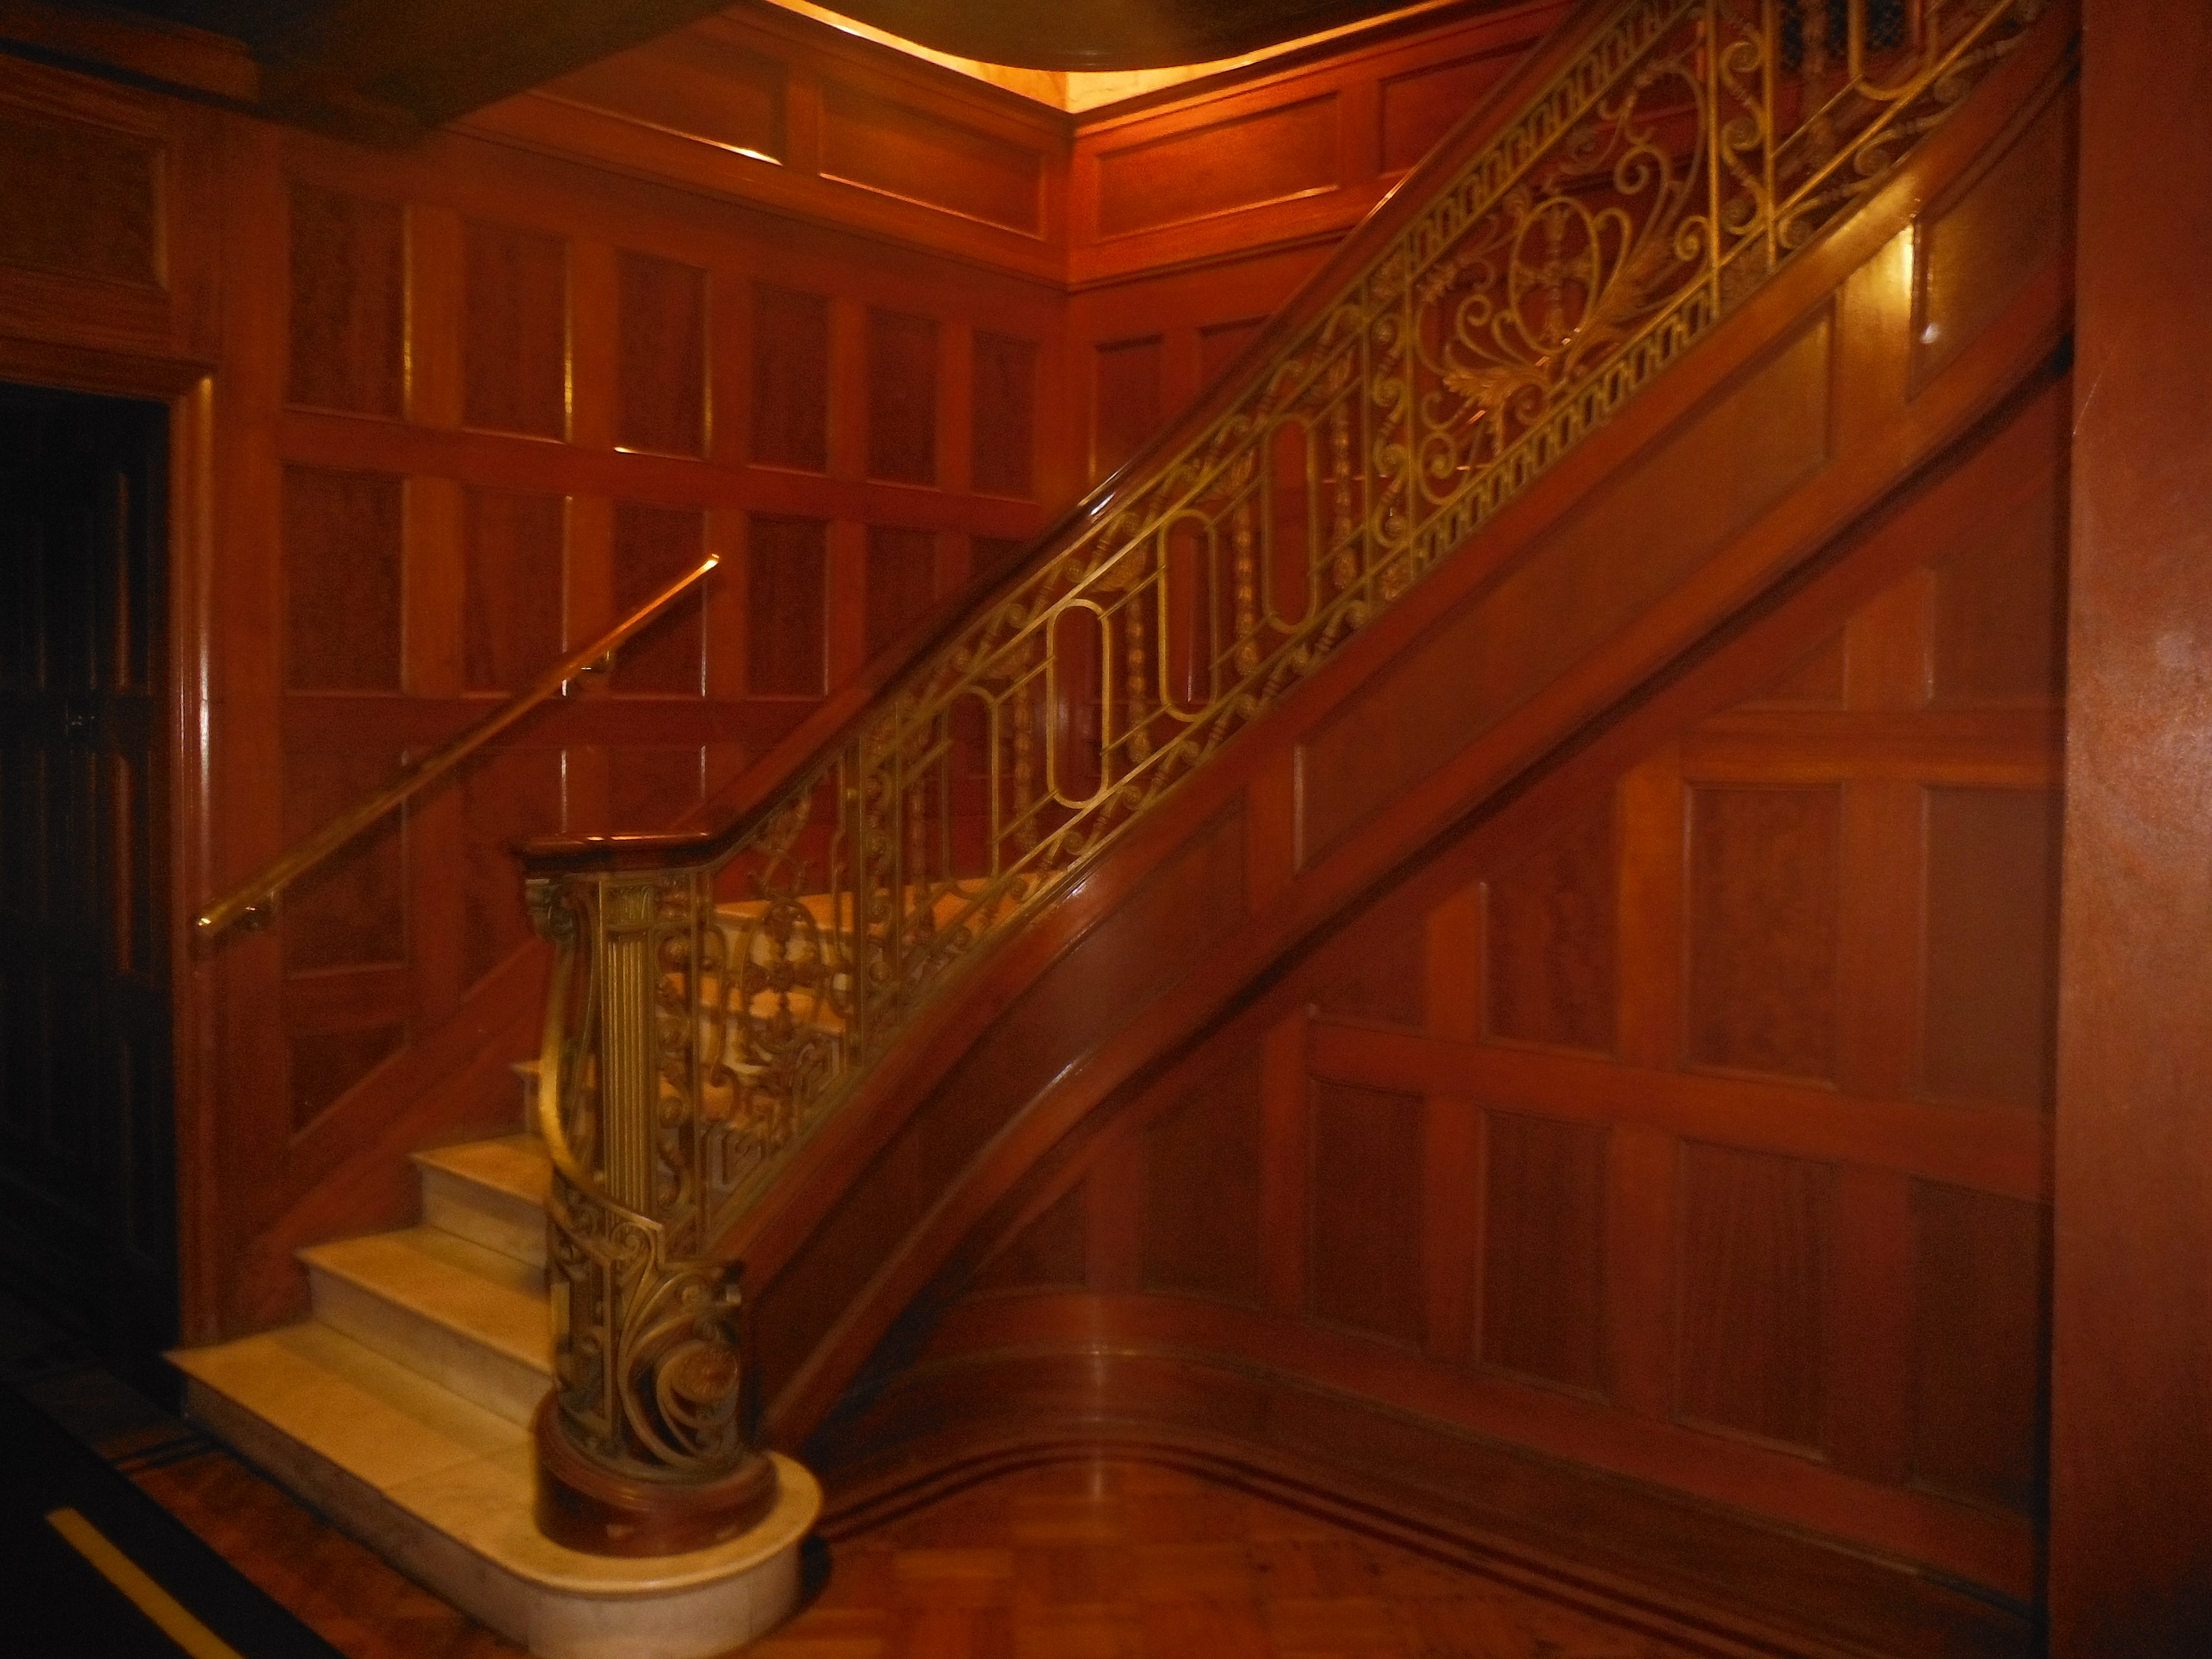 file escalier maison oscar dufresne jpg wikimedia commons. Black Bedroom Furniture Sets. Home Design Ideas